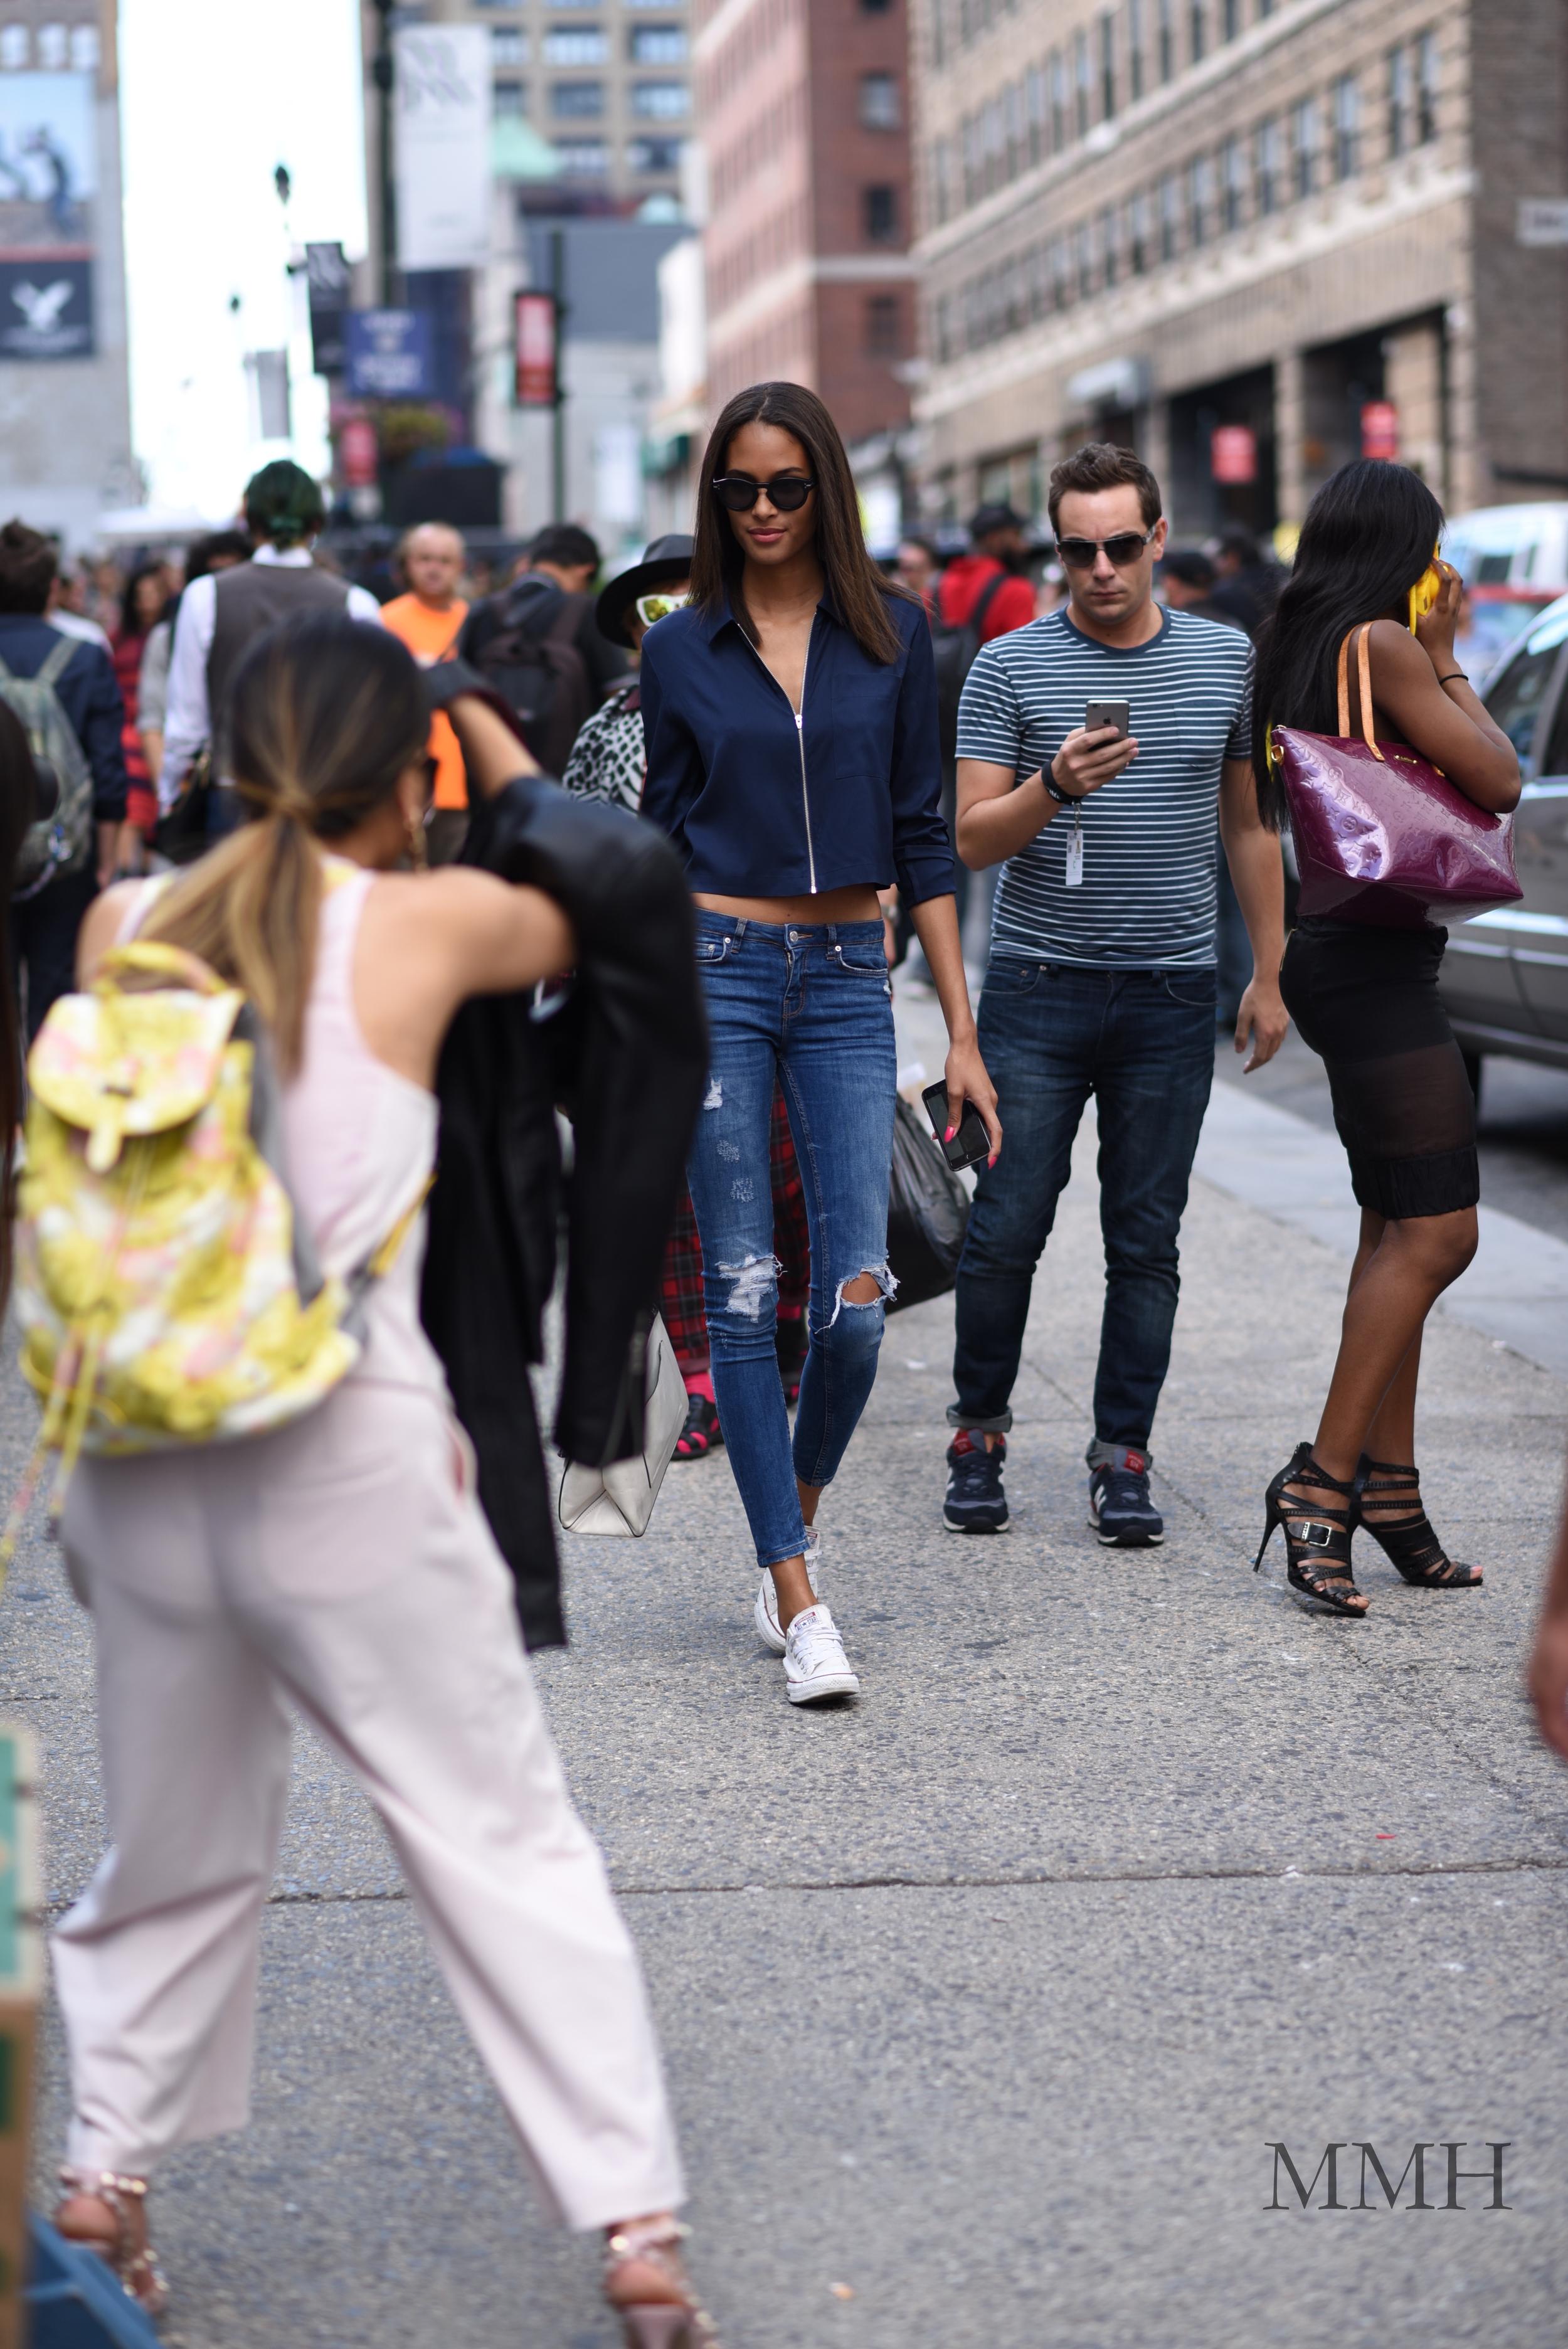 model-at-new-york-fashion-week.jpg